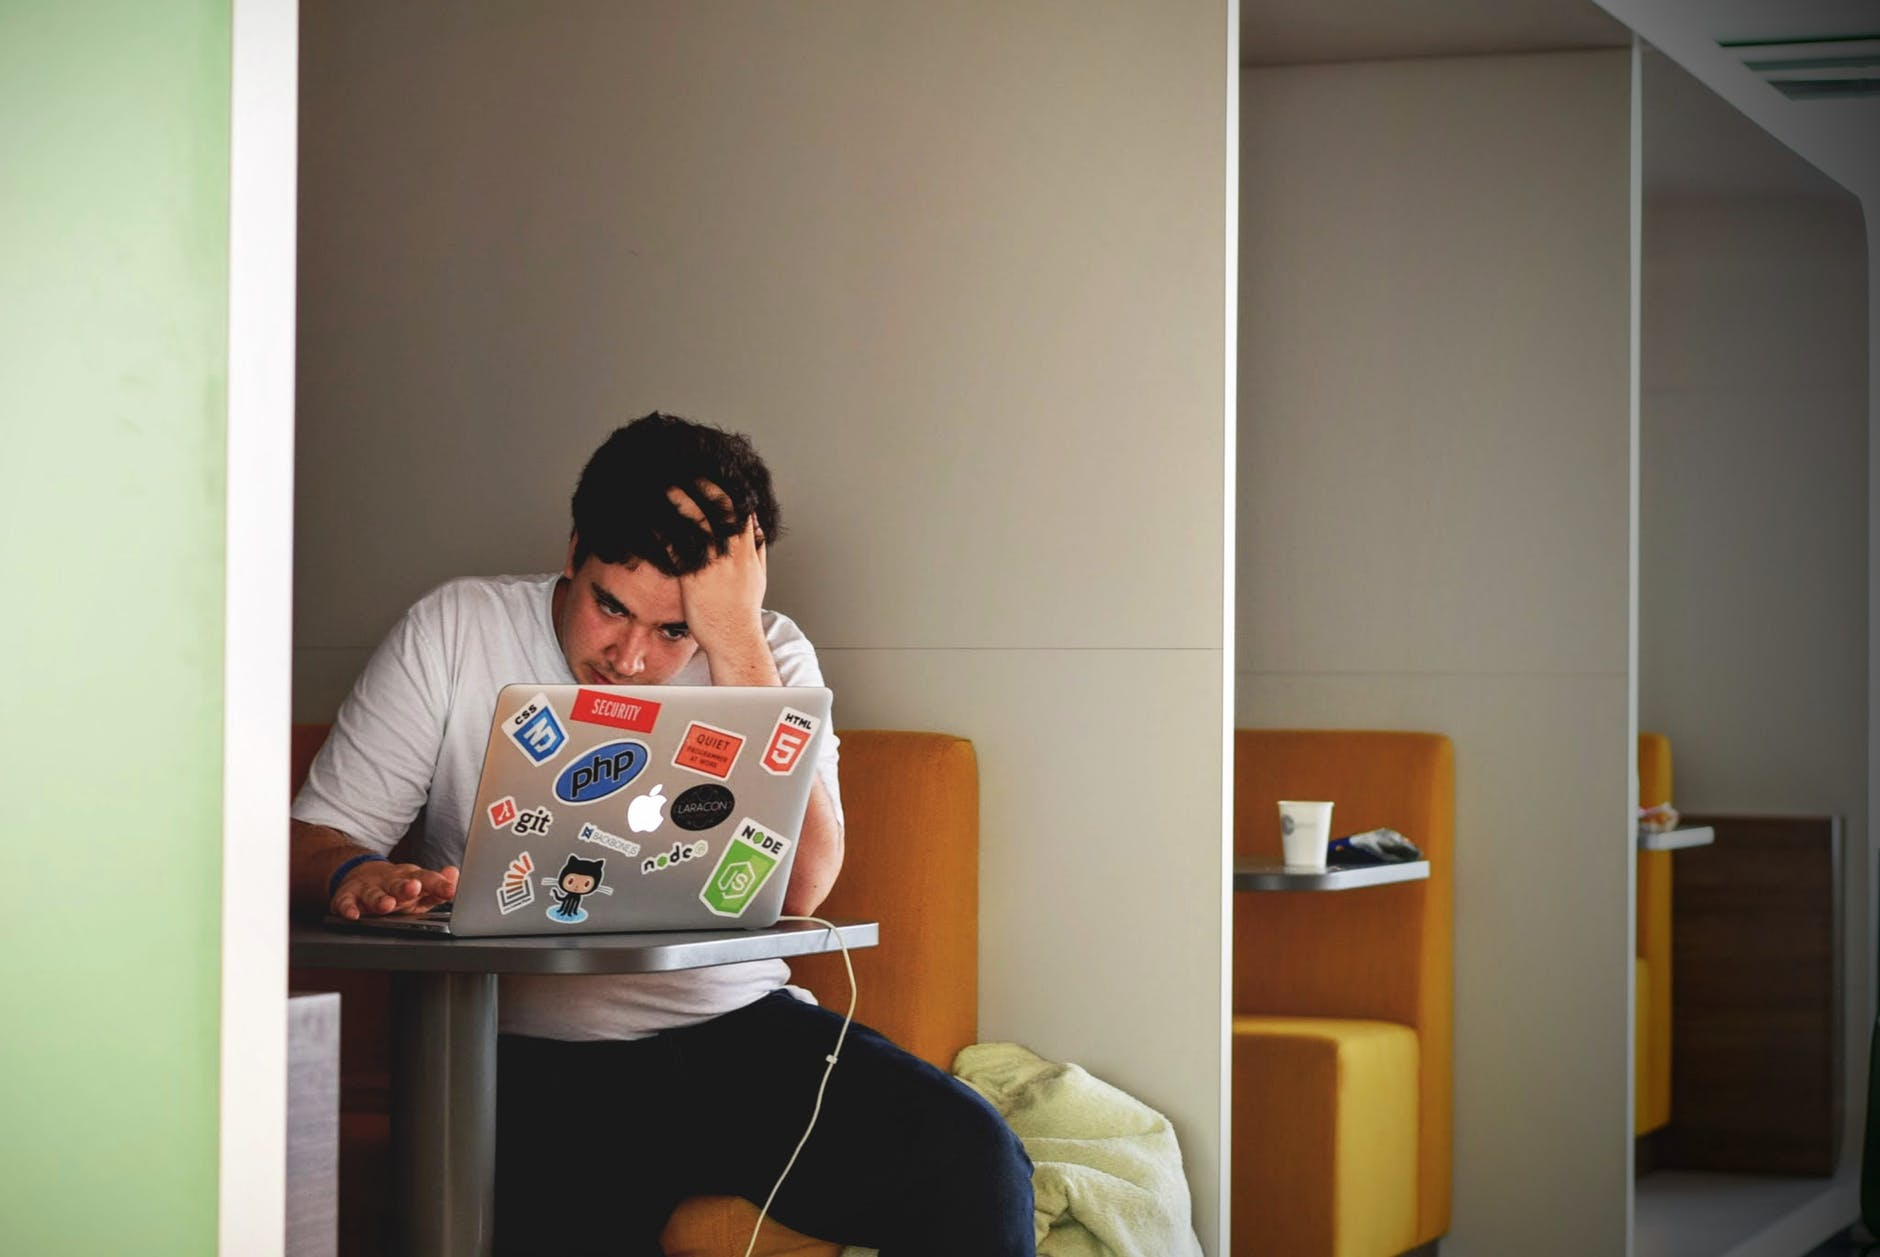 man in white shirt using macbook pro